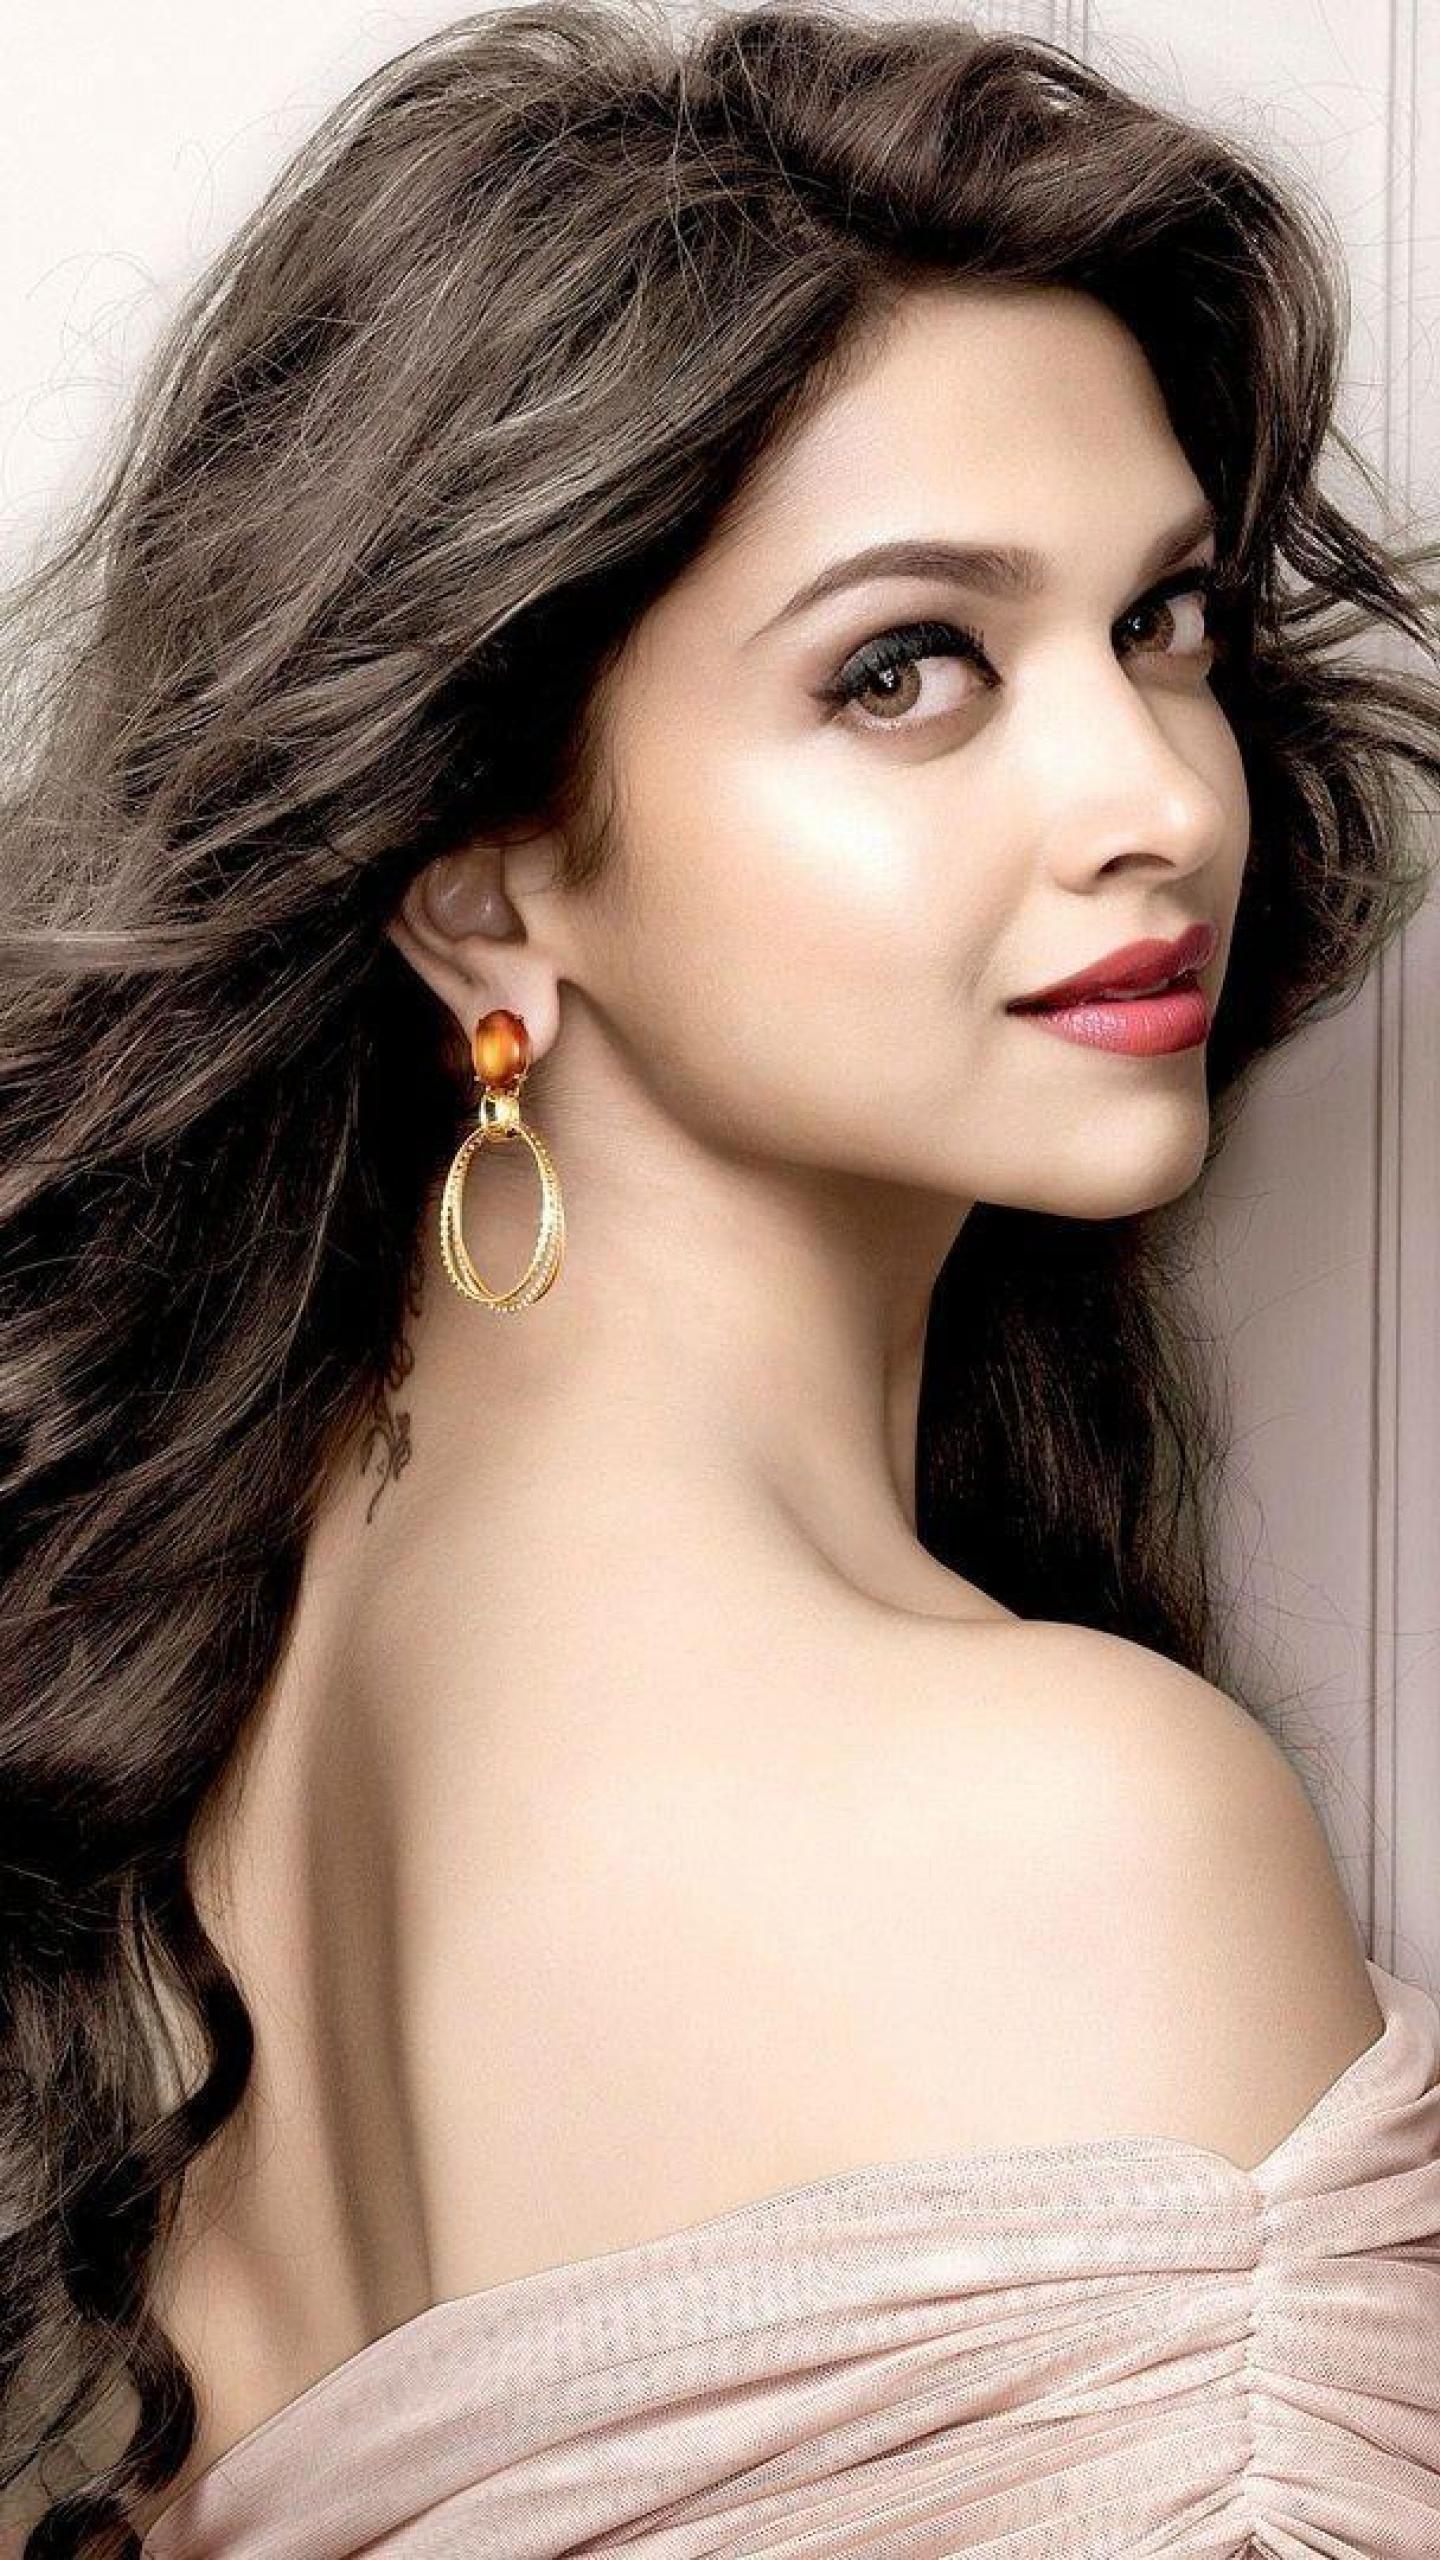 Deepika Padukone Biography Age Height Net Worth Family Movies Buzzzfly Deepika Padukone Style Most Beautiful Indian Actress Beautiful Indian Actress